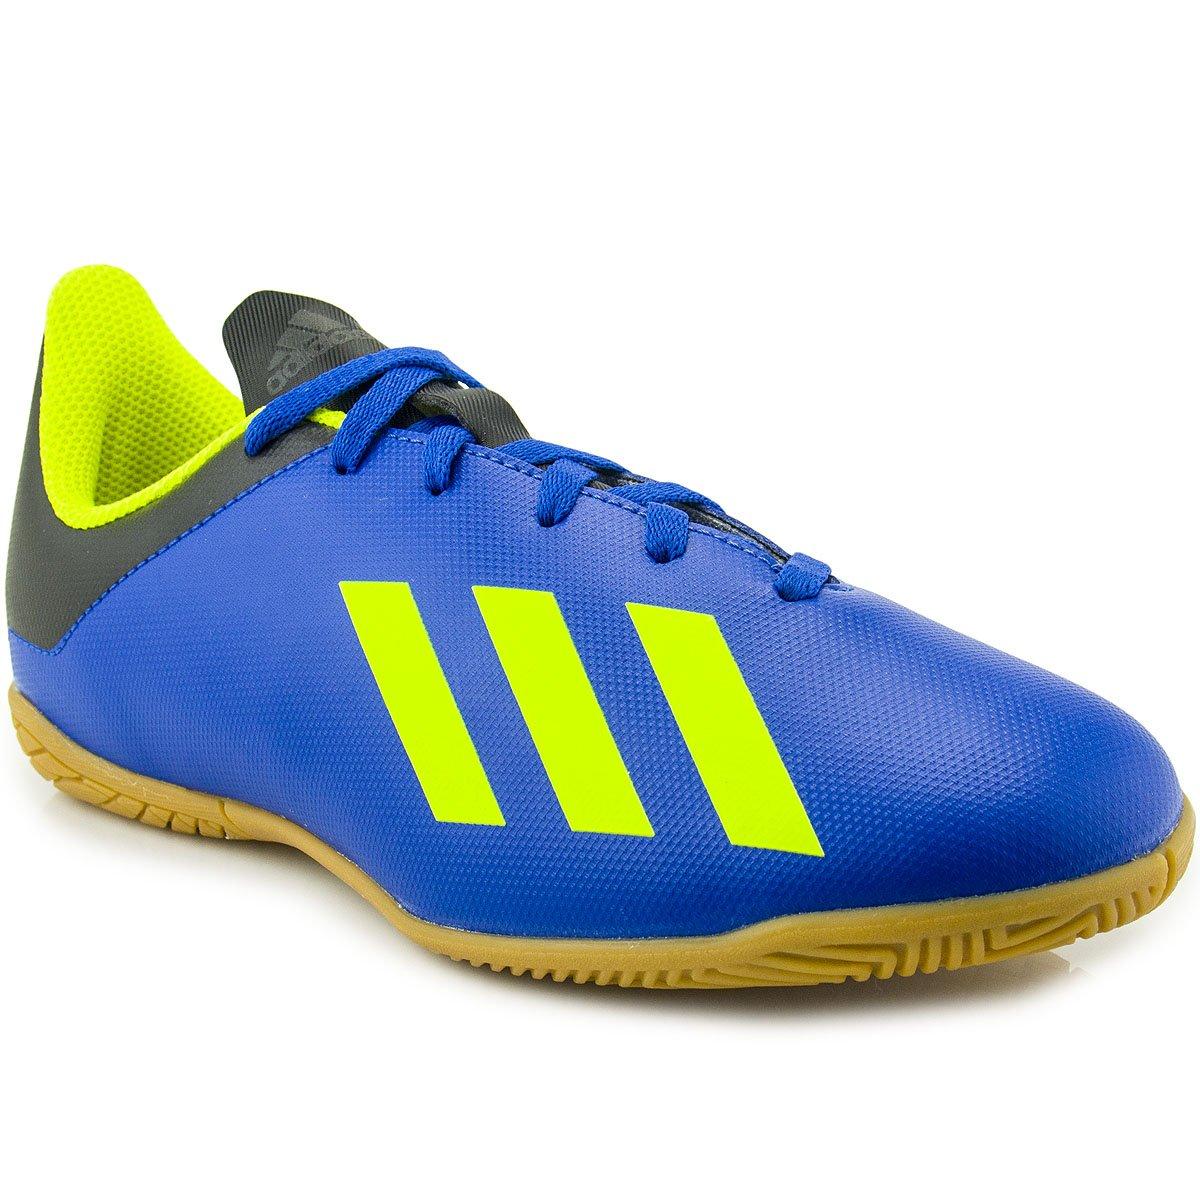 c138341f16103 Chuteira Adidas X Tango 18.4 IN Infantil | Futsal | MaxTennis